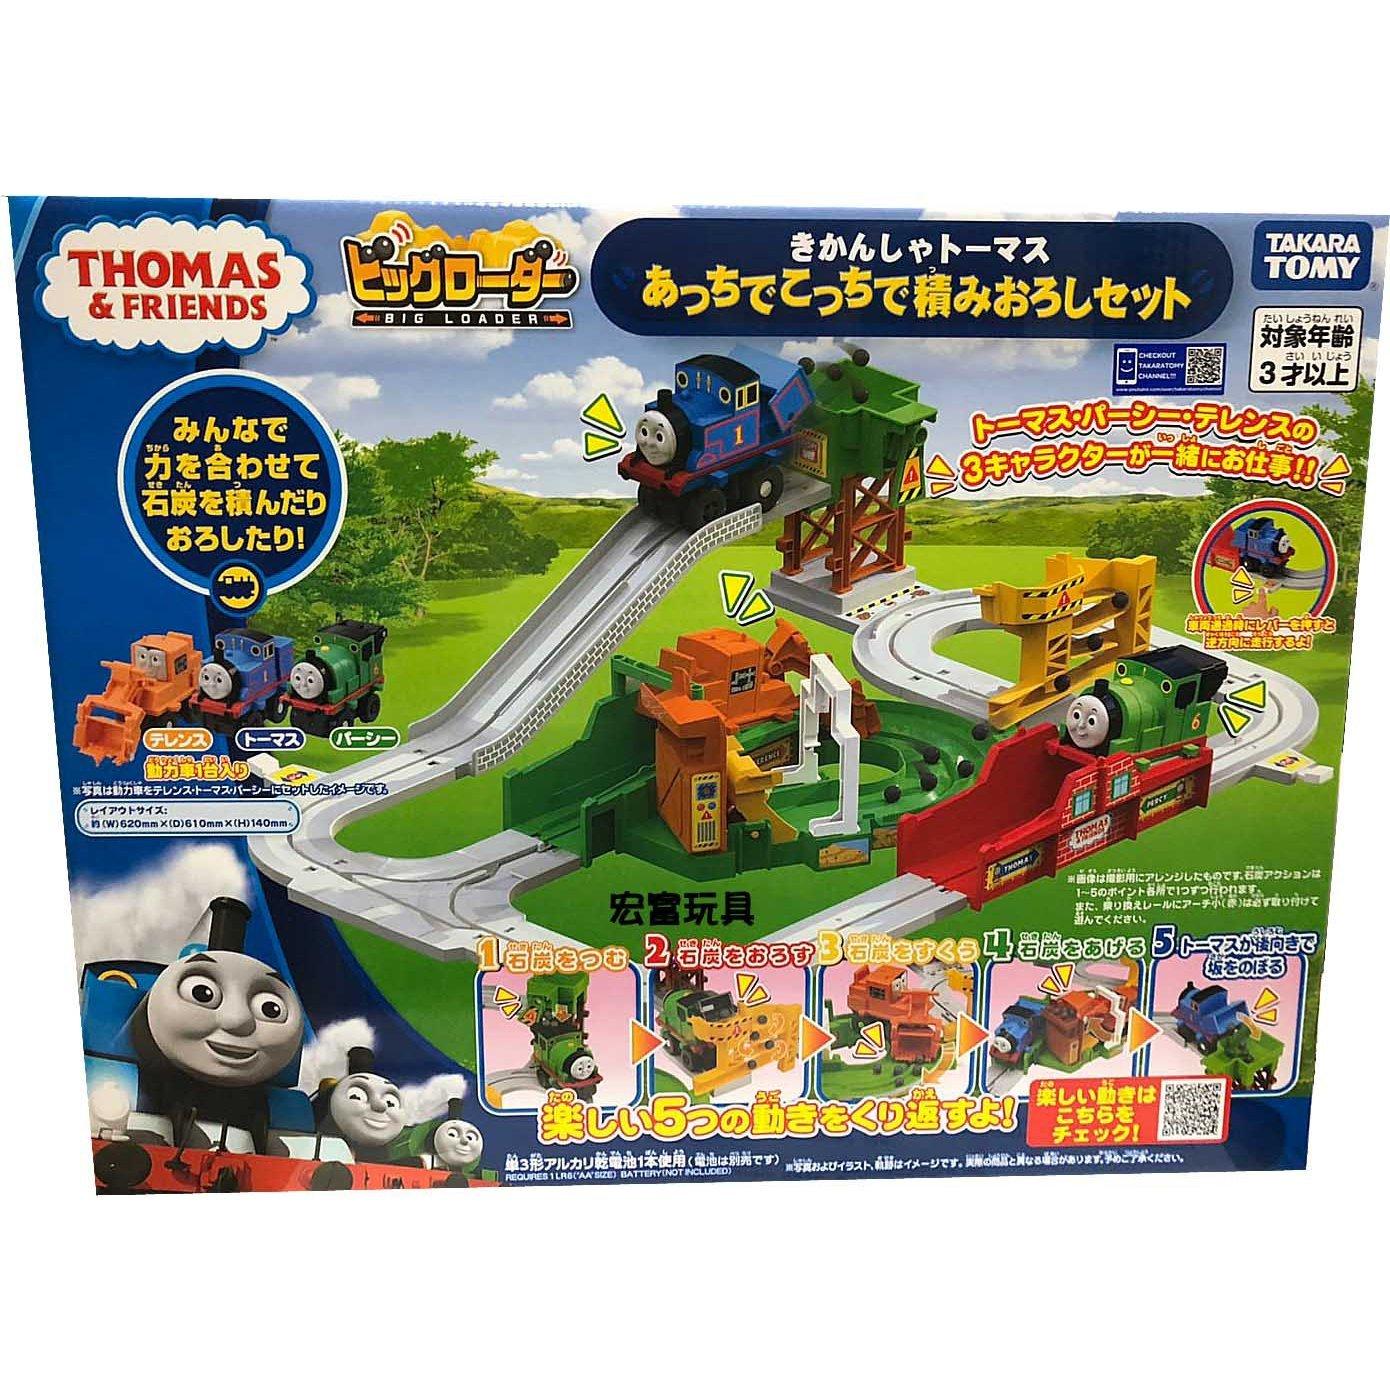 TOMY 湯瑪士電動工程車組